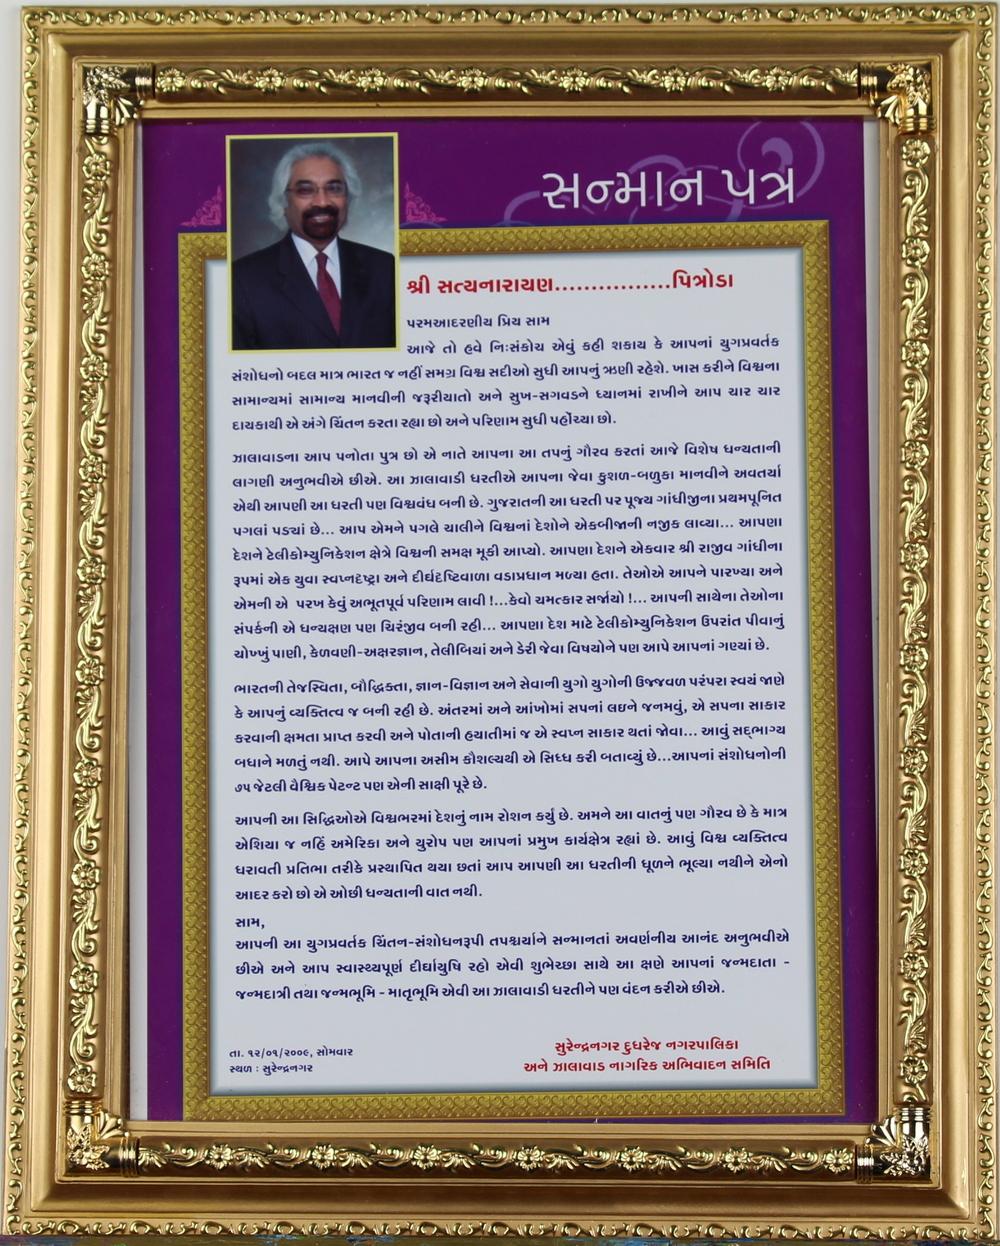 Award of Appreciation Letter, Surendra Nagar Dudhrej Nagar Palika & Zalavad Nagrik Abhivadan Samiti, 2009